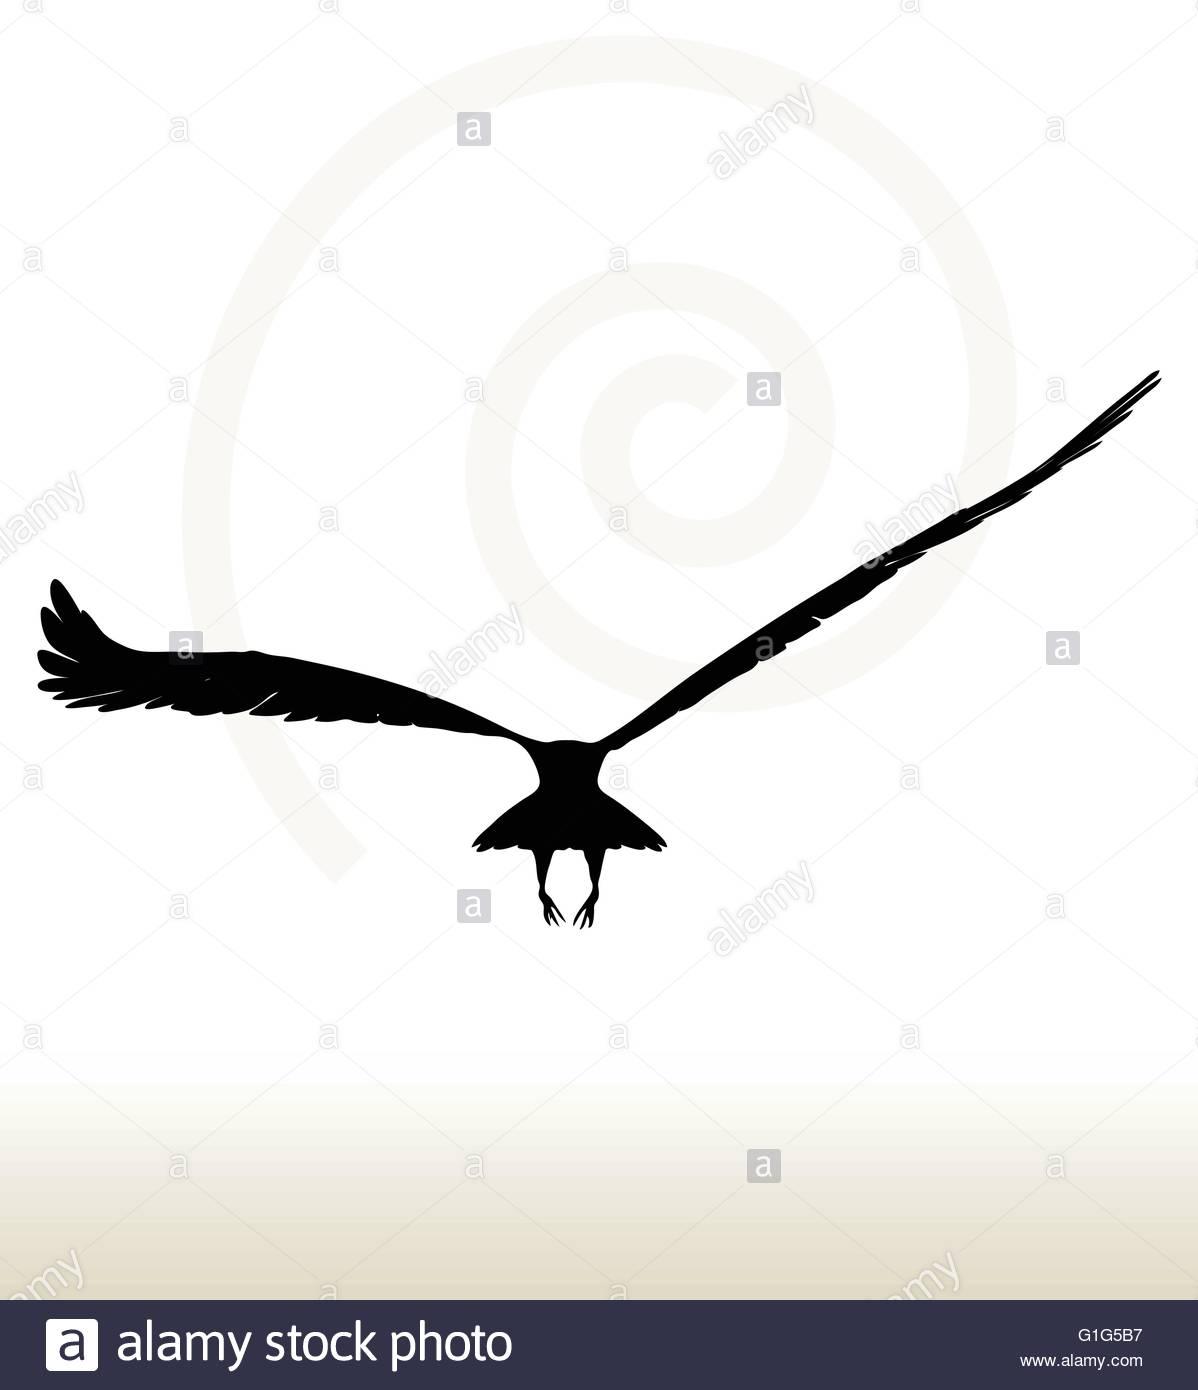 1198x1390 Sparrow Hawk Flying Stock Photos Amp Sparrow Hawk Flying Stock